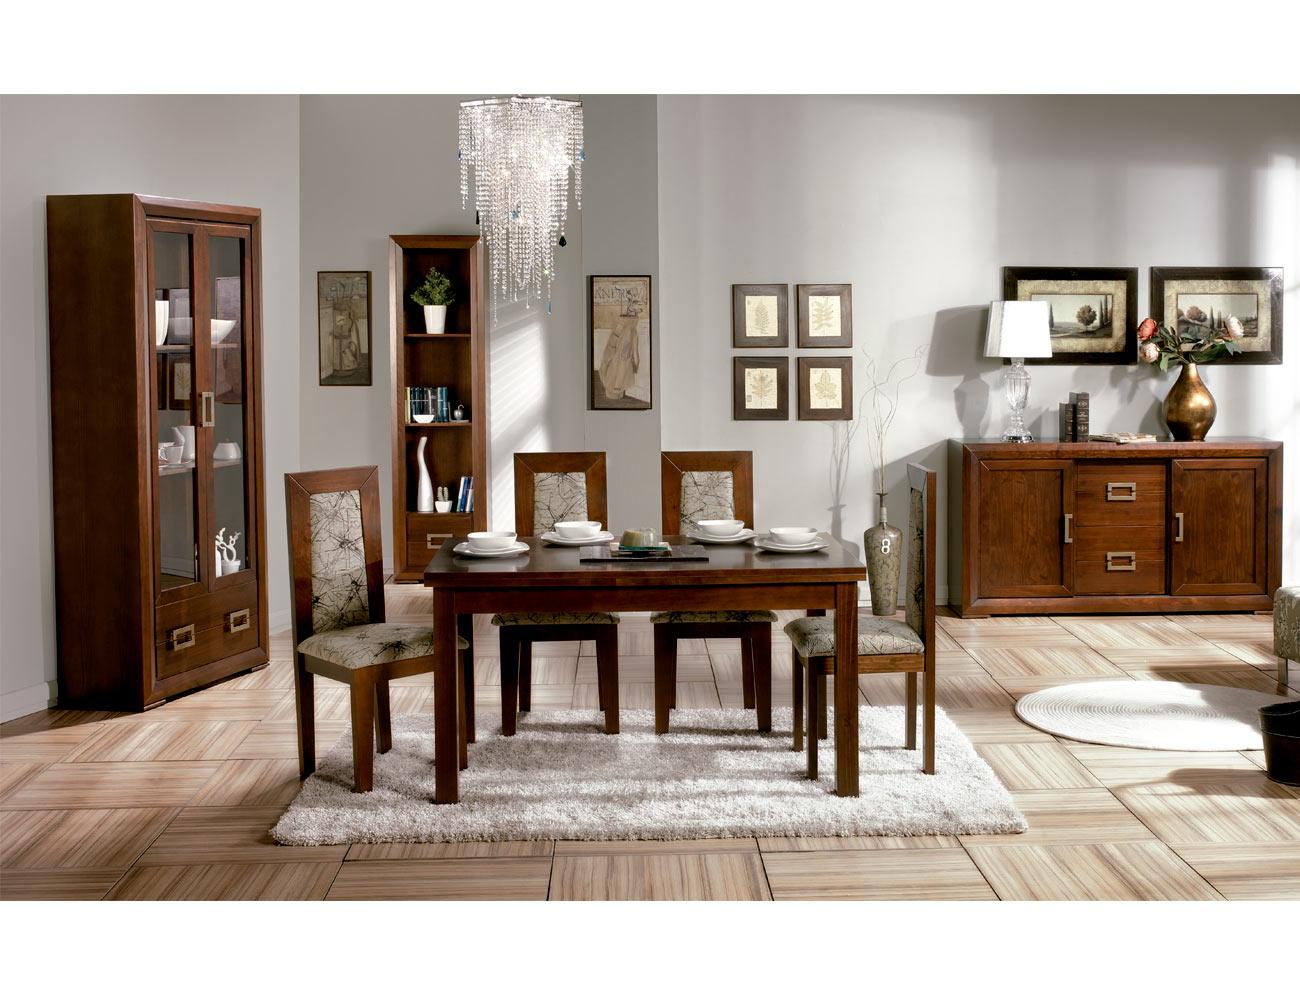 Composicion34 mueble salon comedor madera4